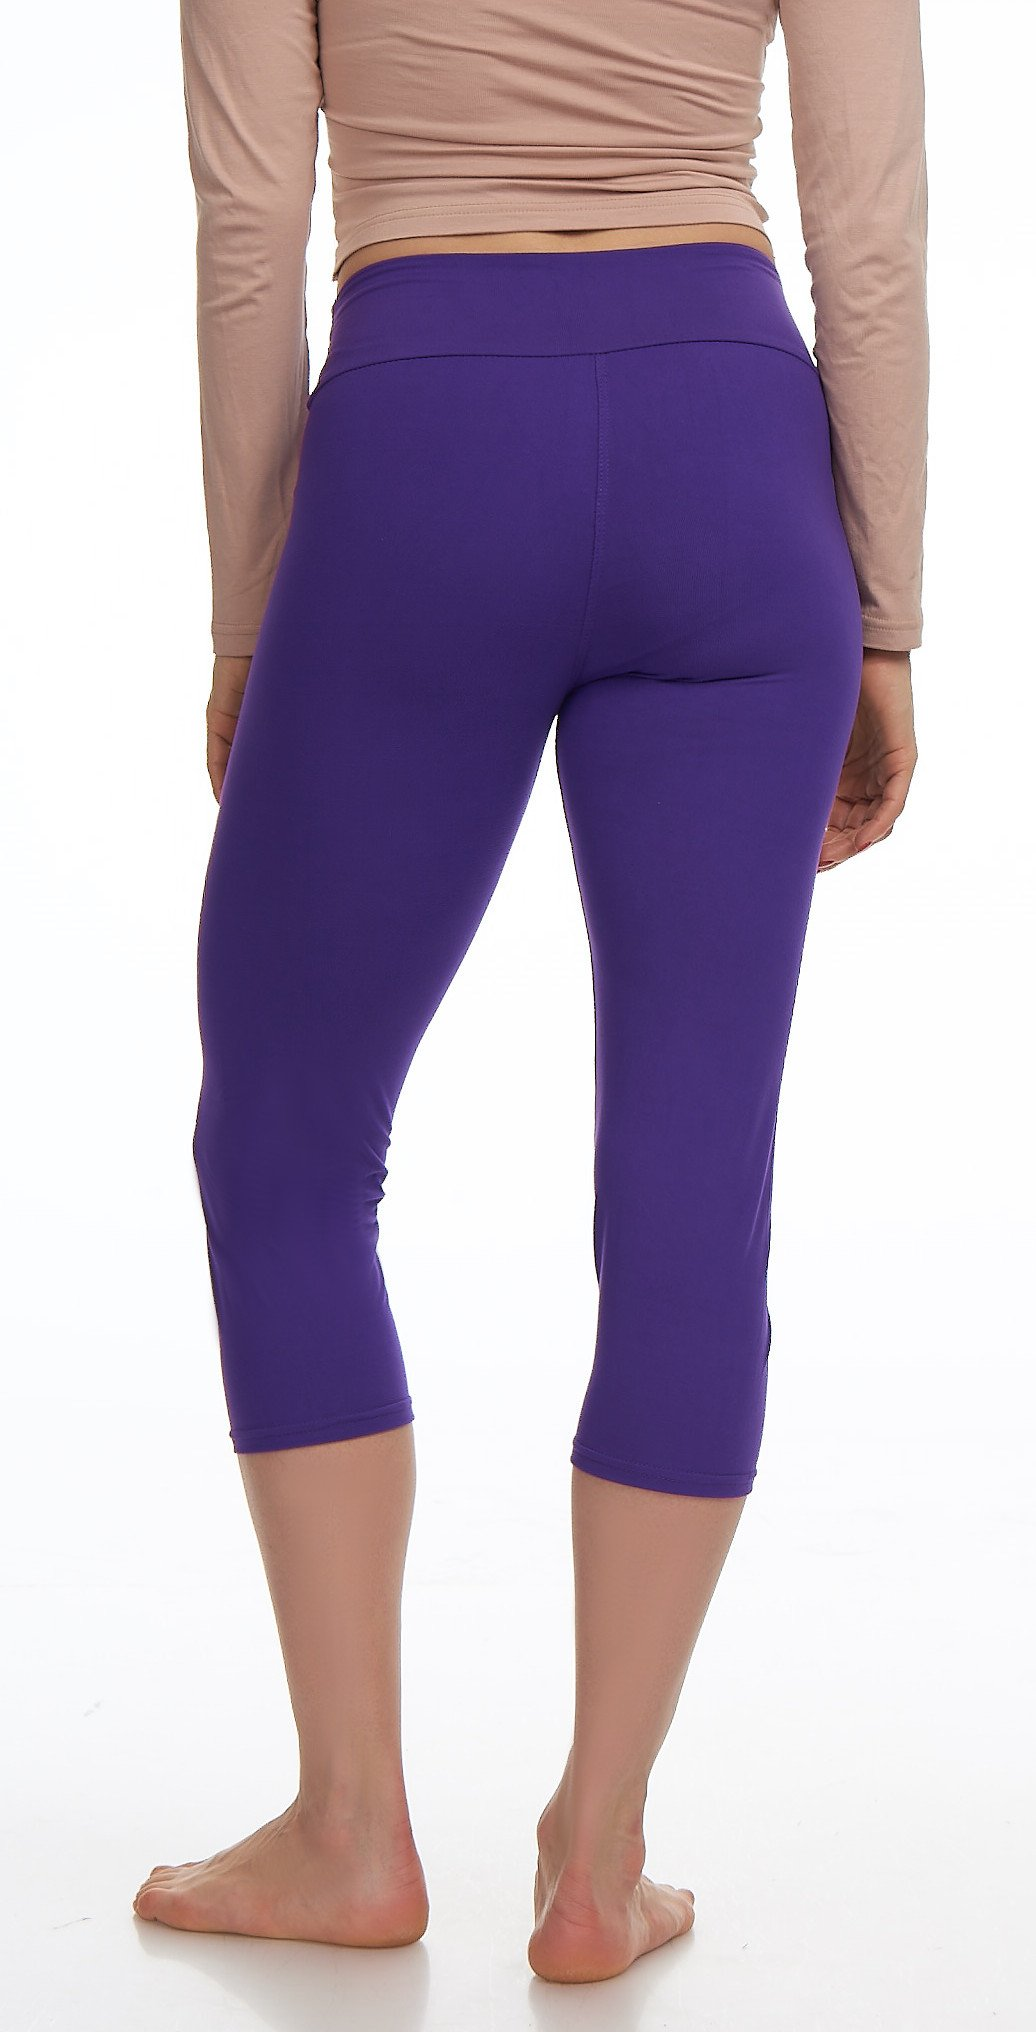 Lush Moda Extra Soft Leggings Variety of ColorsPlus Size Yoga Waist Purple, One Size fits Most (XL 3XL), Purple Yoga Waist by LMB (Image #6)